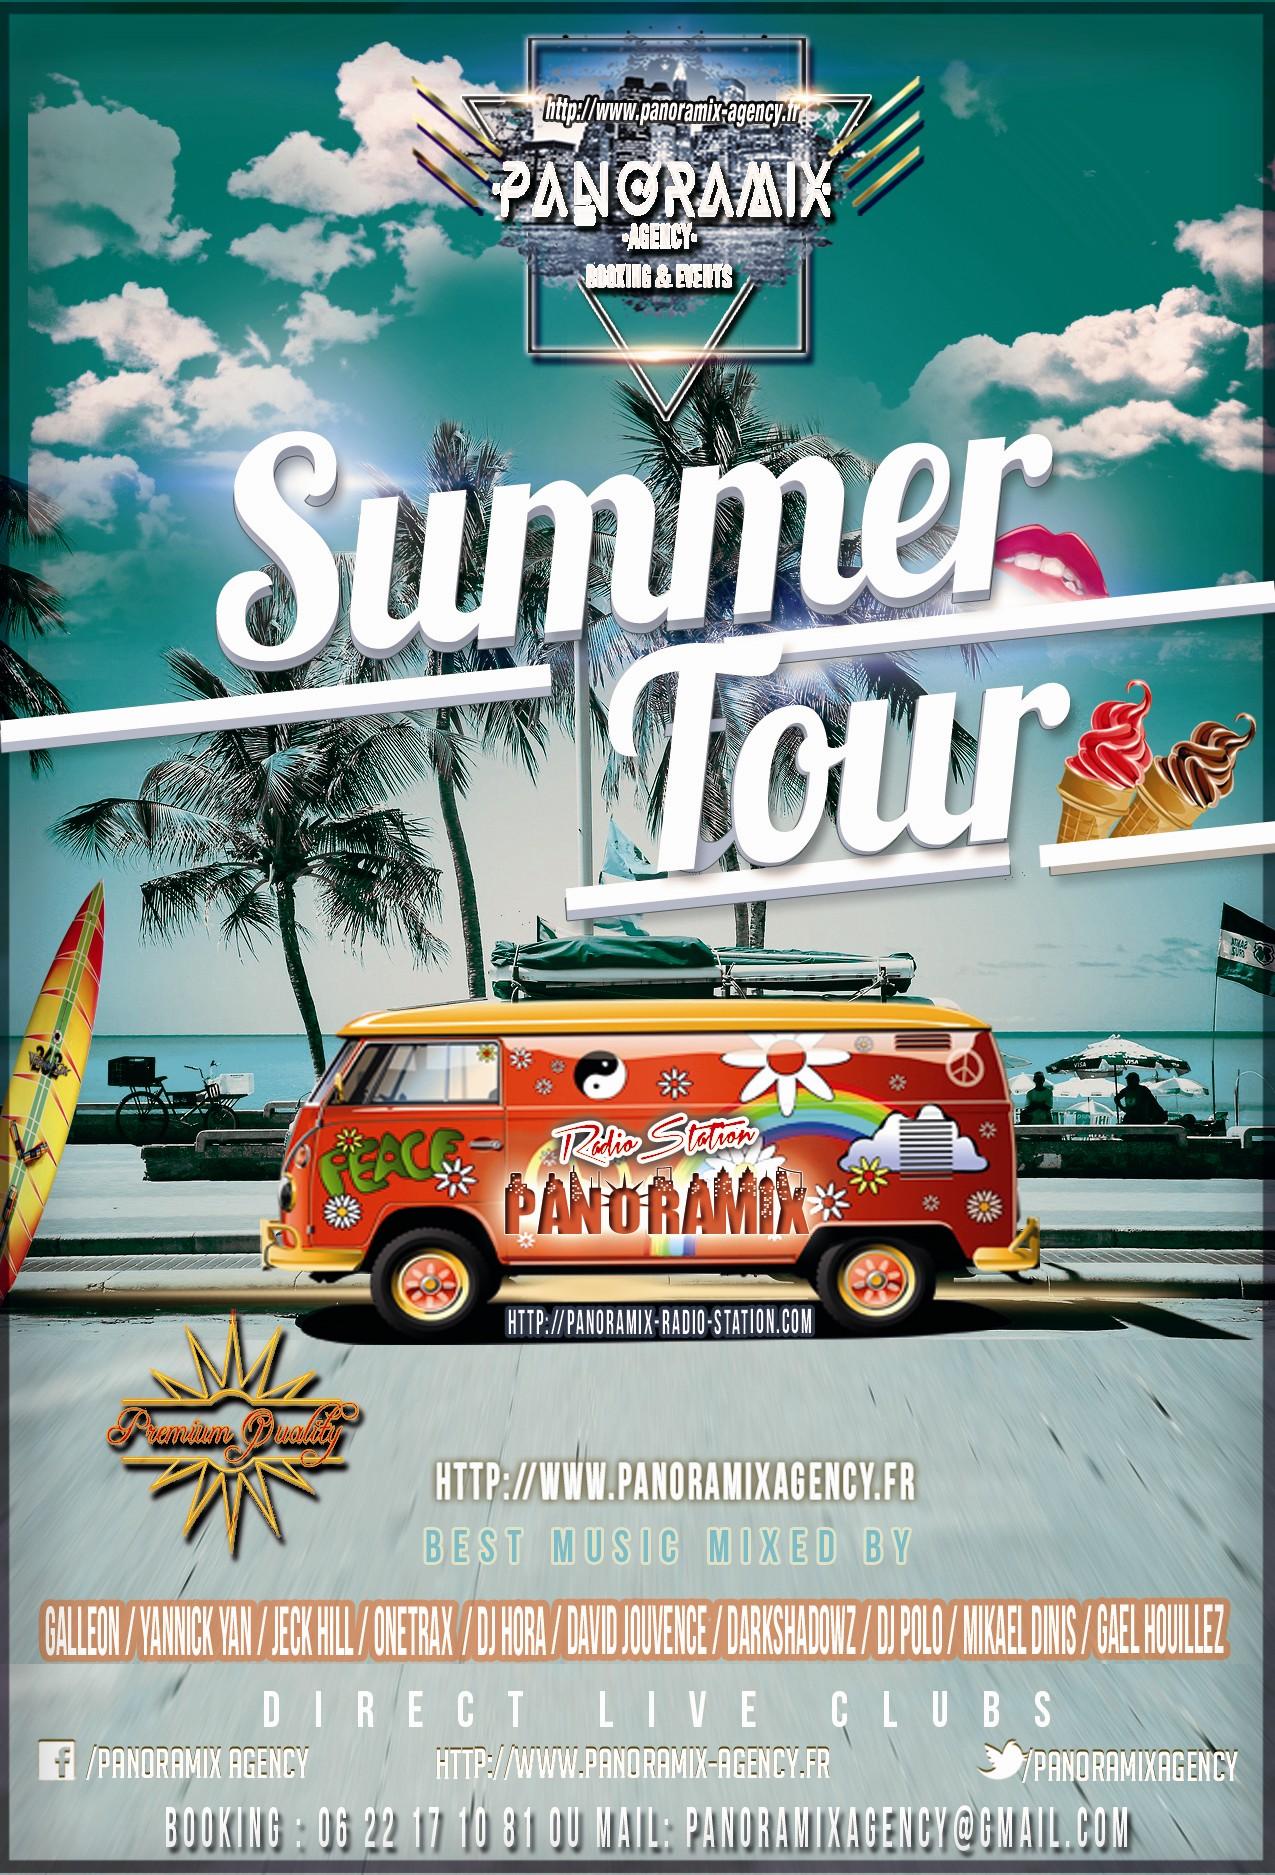 http://panoramix-radio-station.com/wp-content/uploads/2017/07/summer-tour1-wv-.jpg